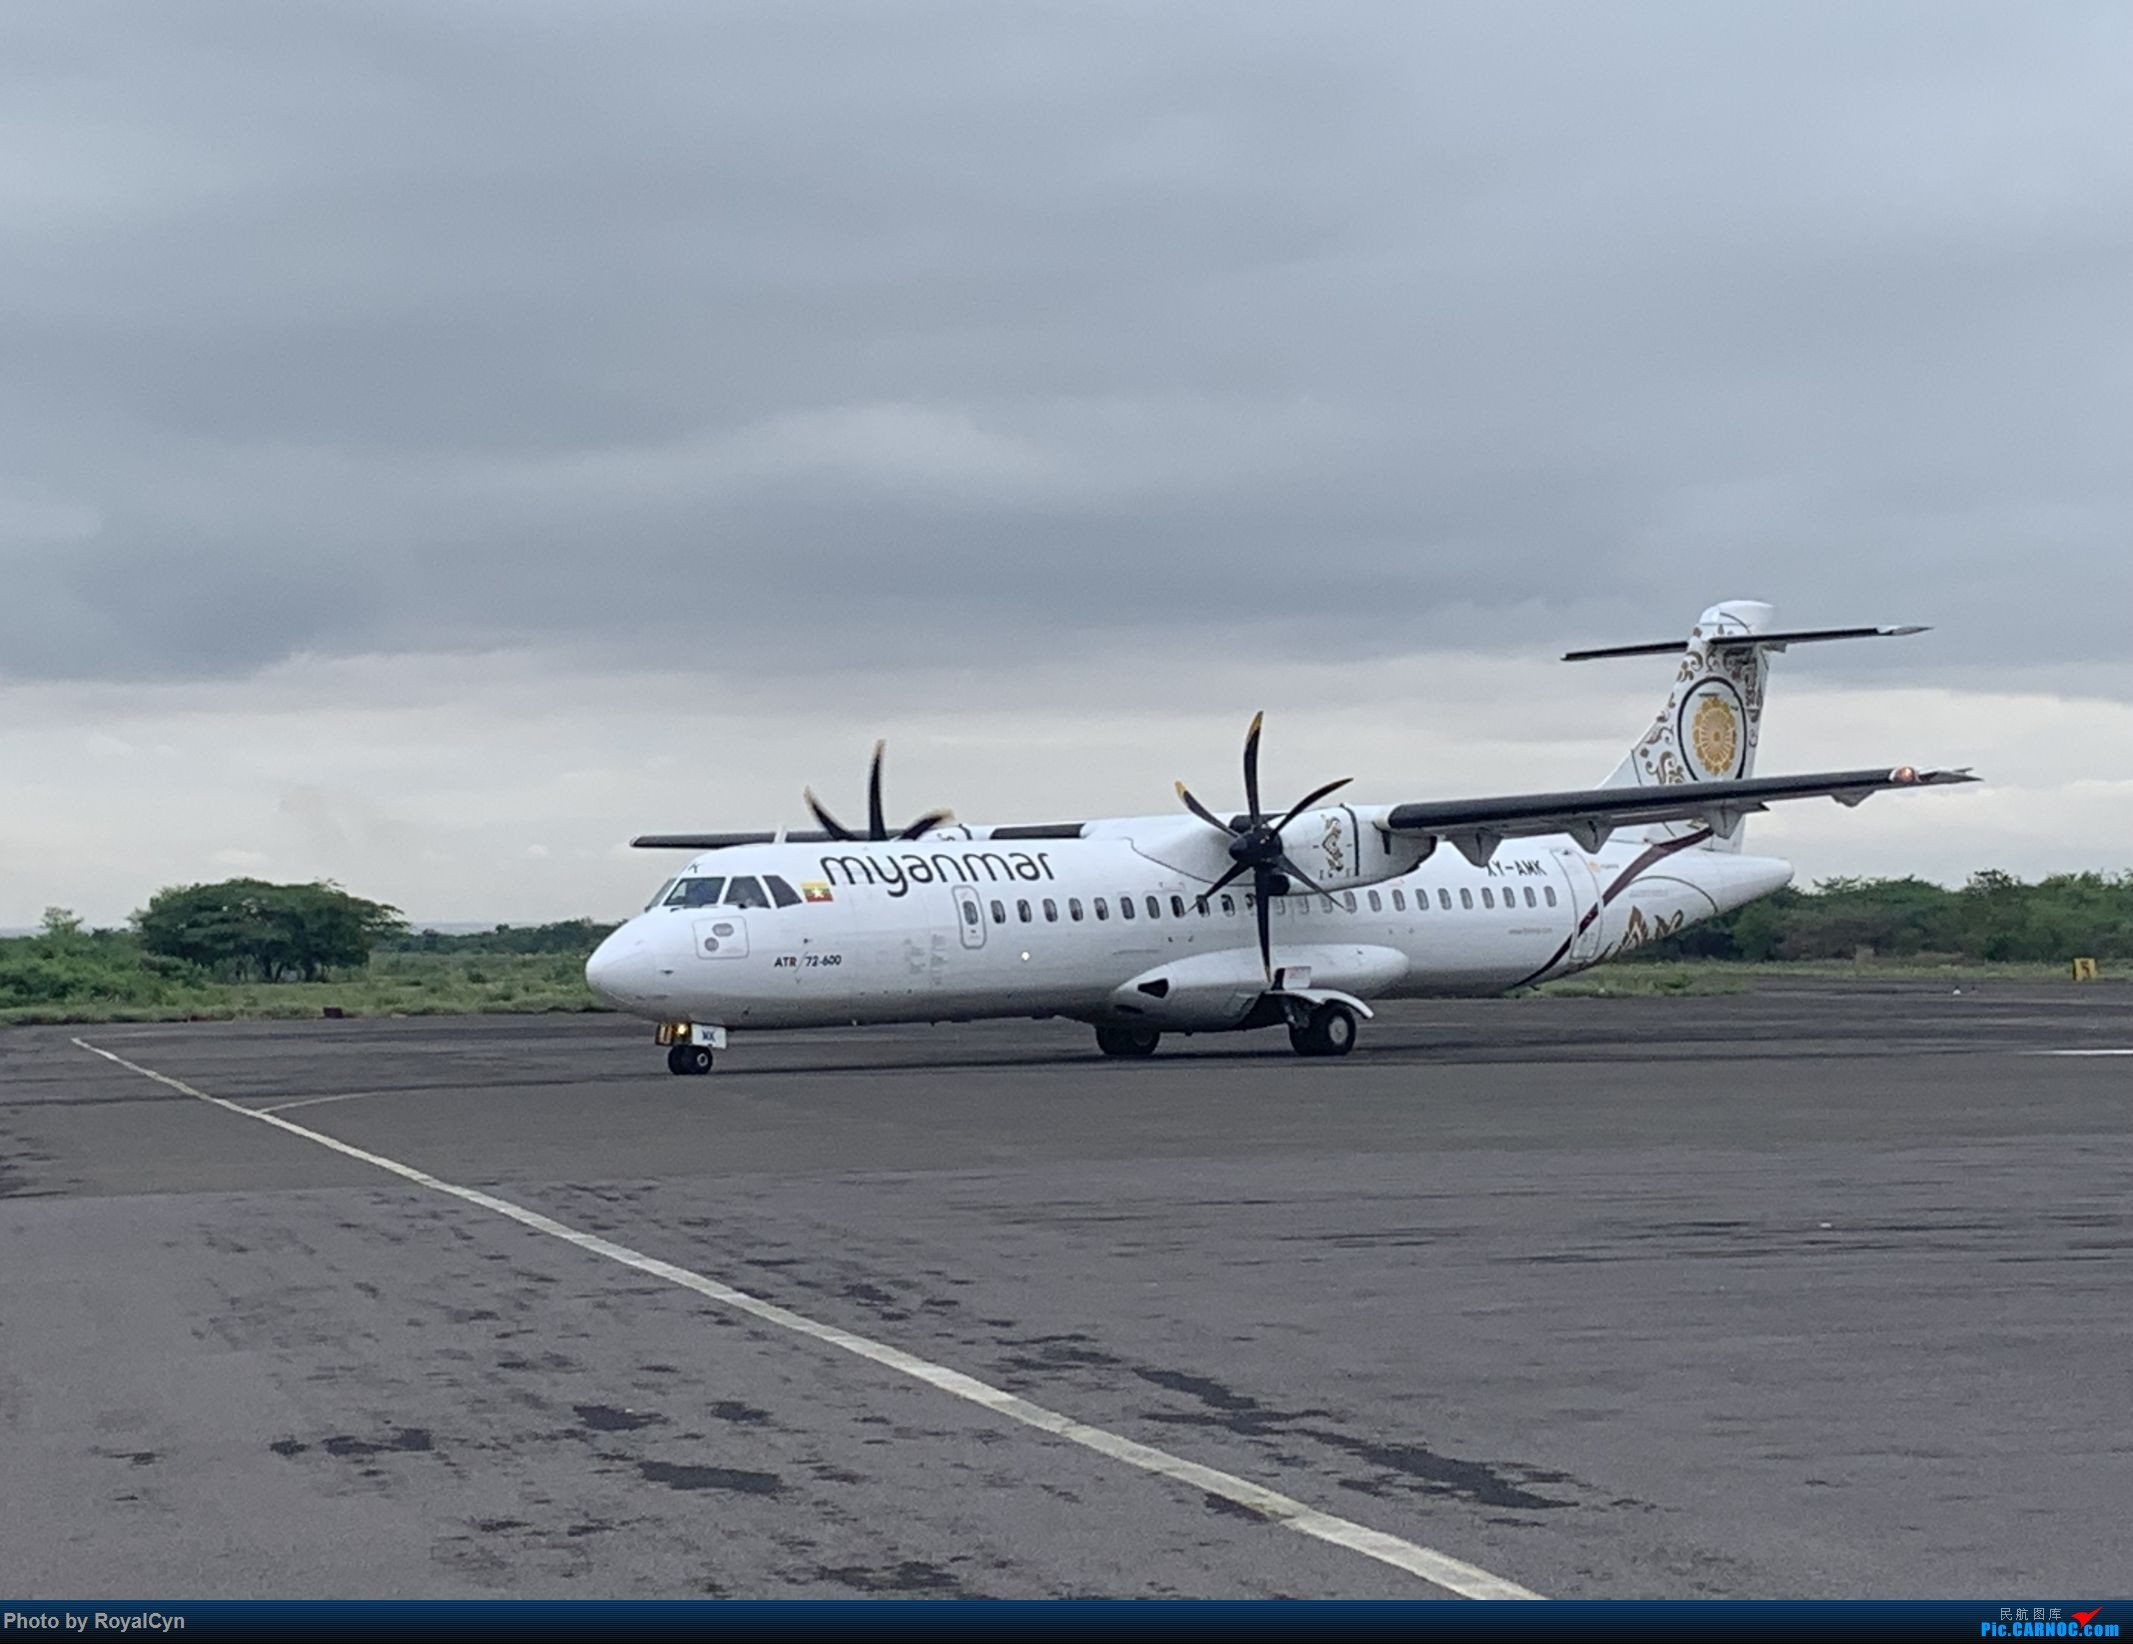 Re:[原创]Royal游记No.3【佛塔国度狂想曲——棉麻国缅甸】三城6日游 ATR-72 XY-AWK 缅甸良乌机场